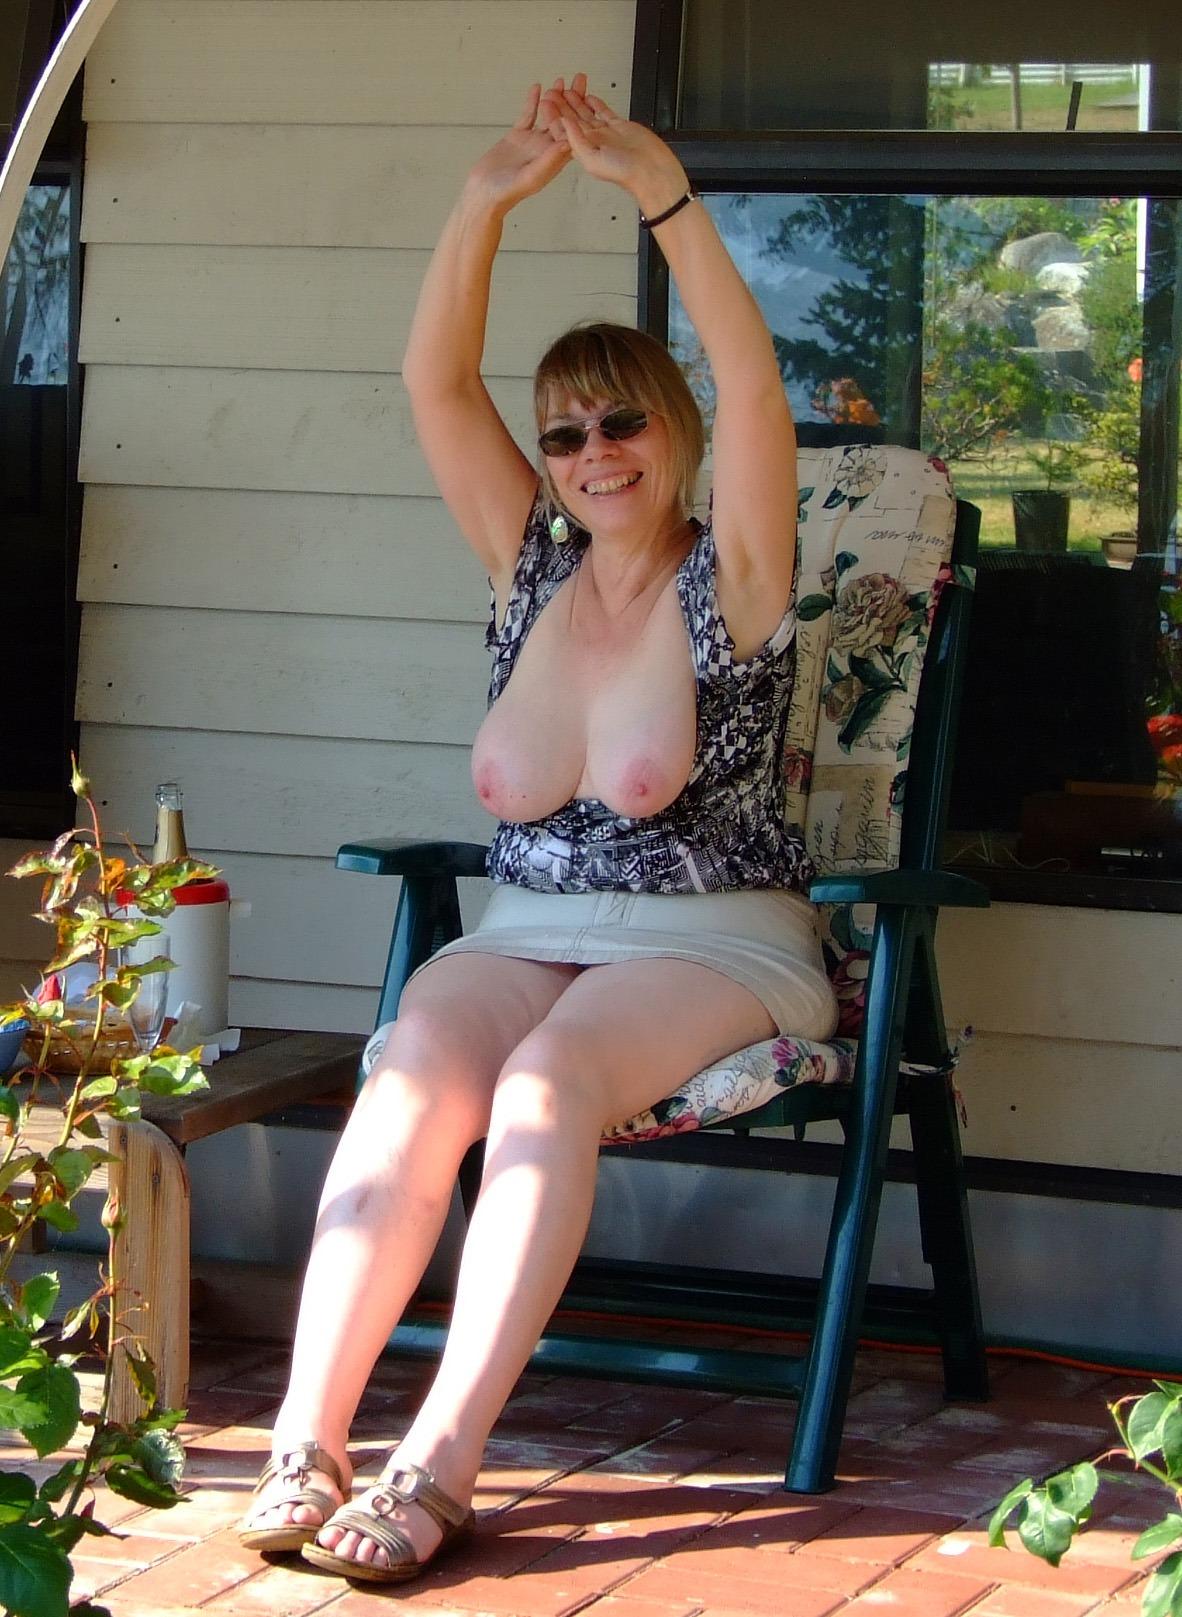 43 Летняя баба обнажает груди даже за пределами на кухне